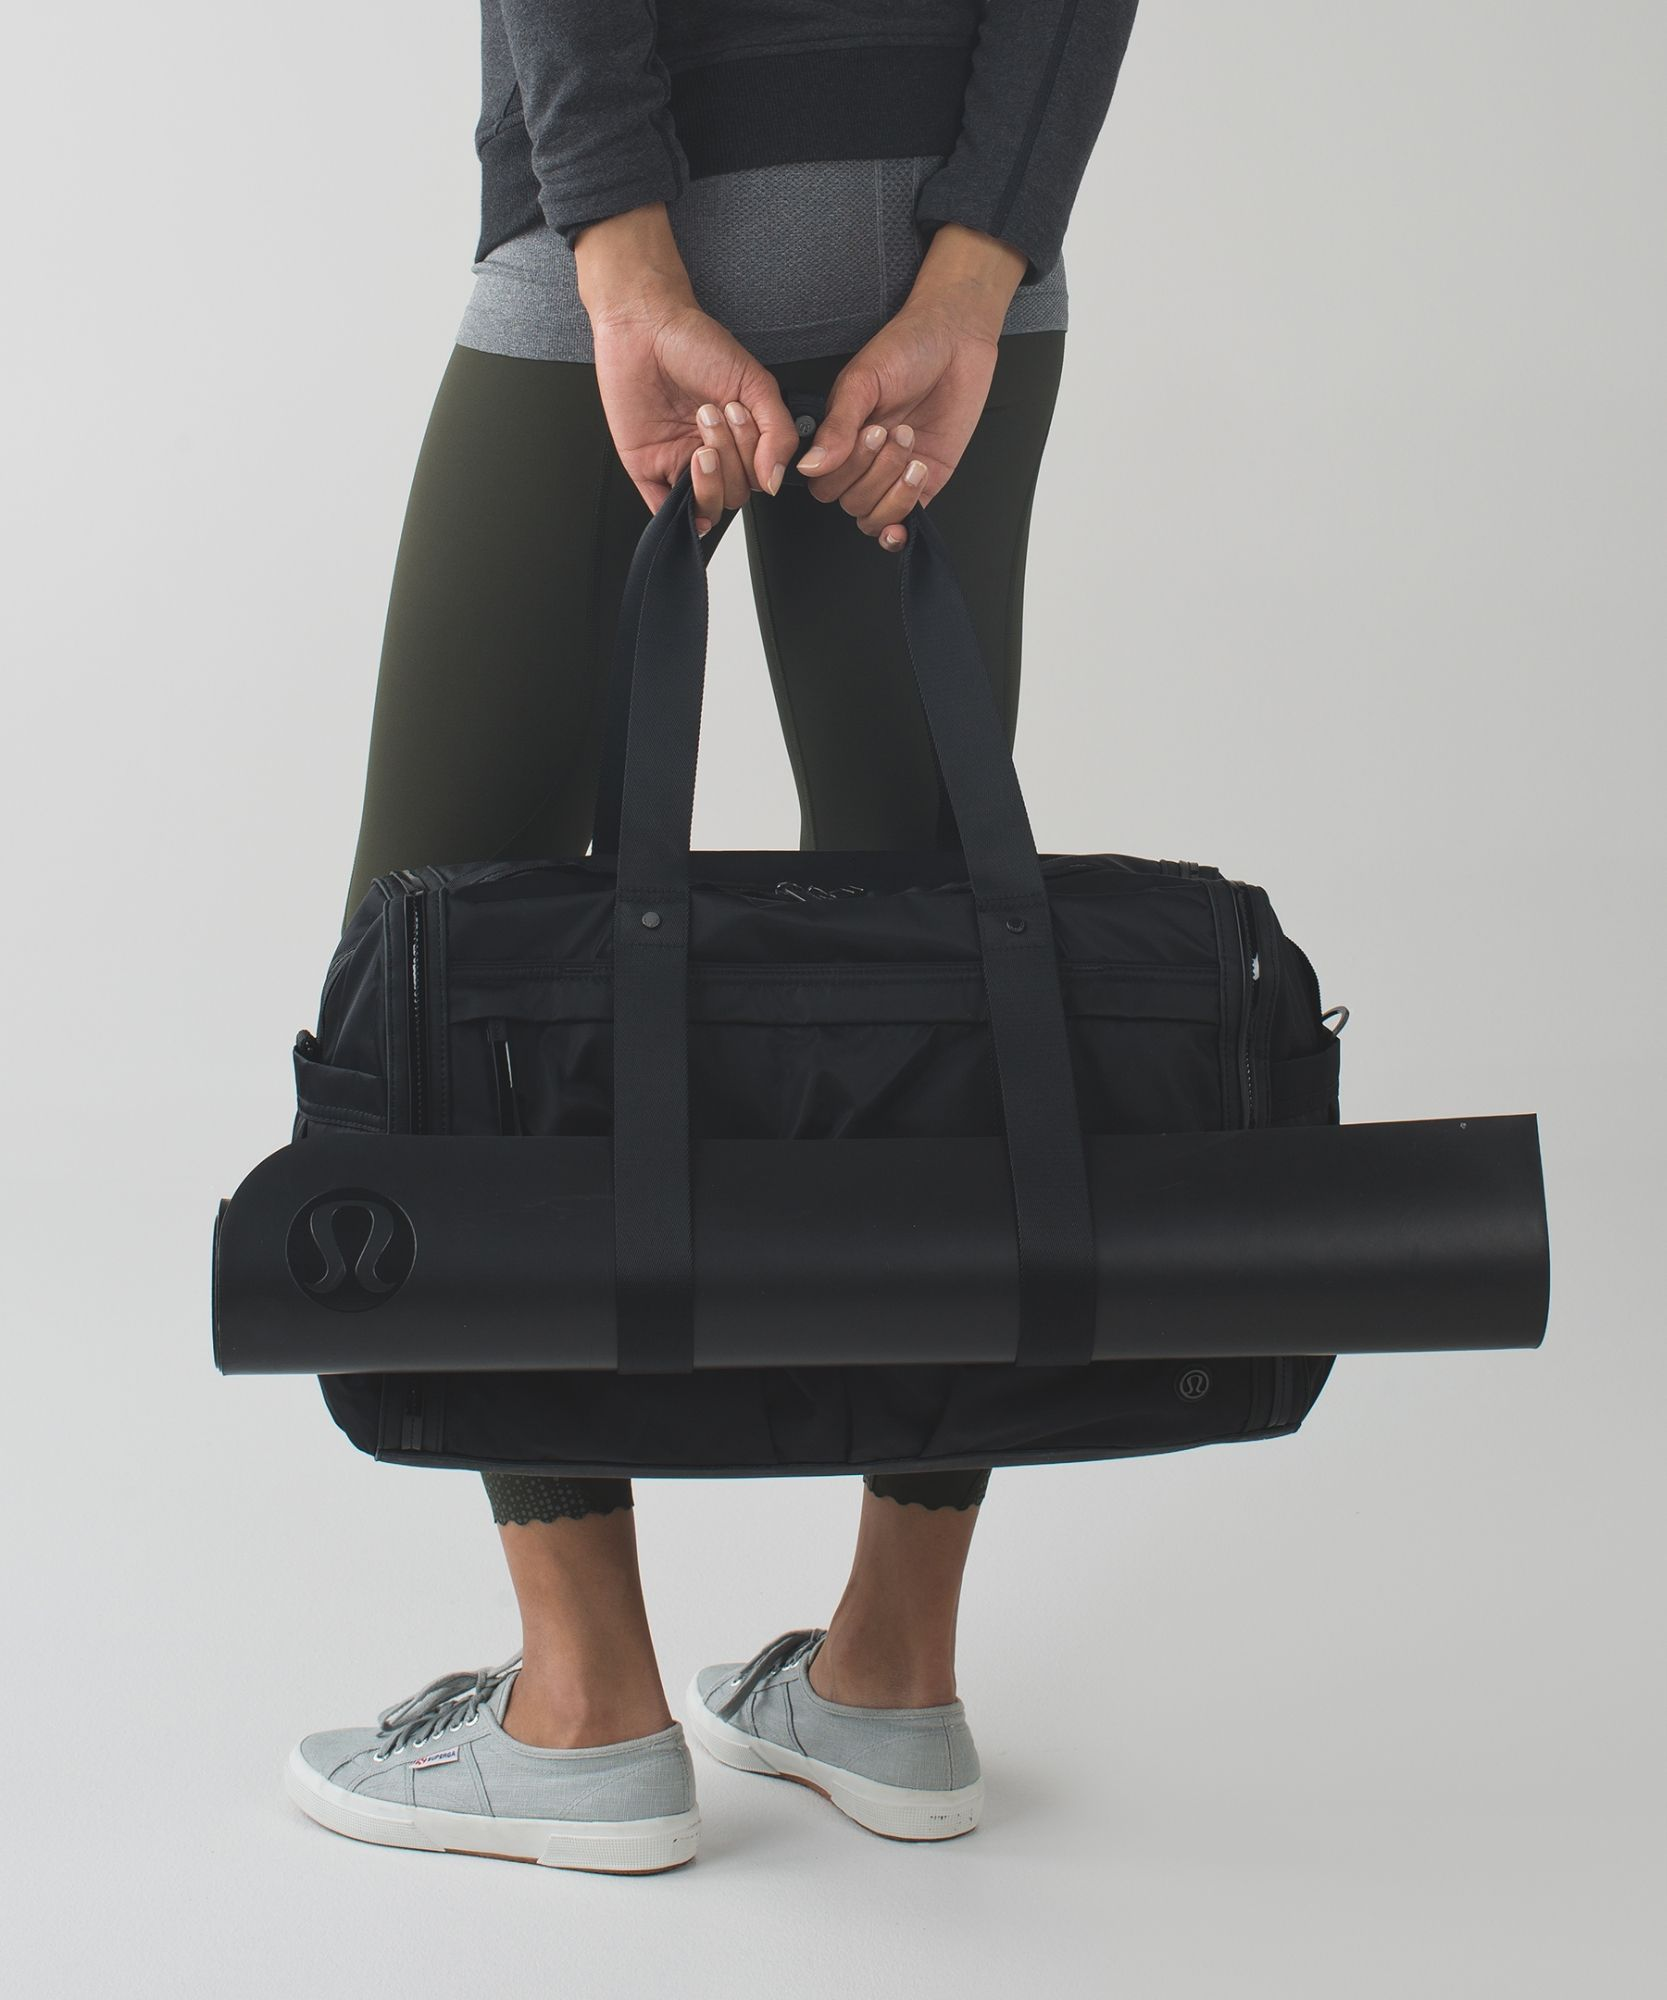 44+ Gym bag with yoga mat holder inspirations